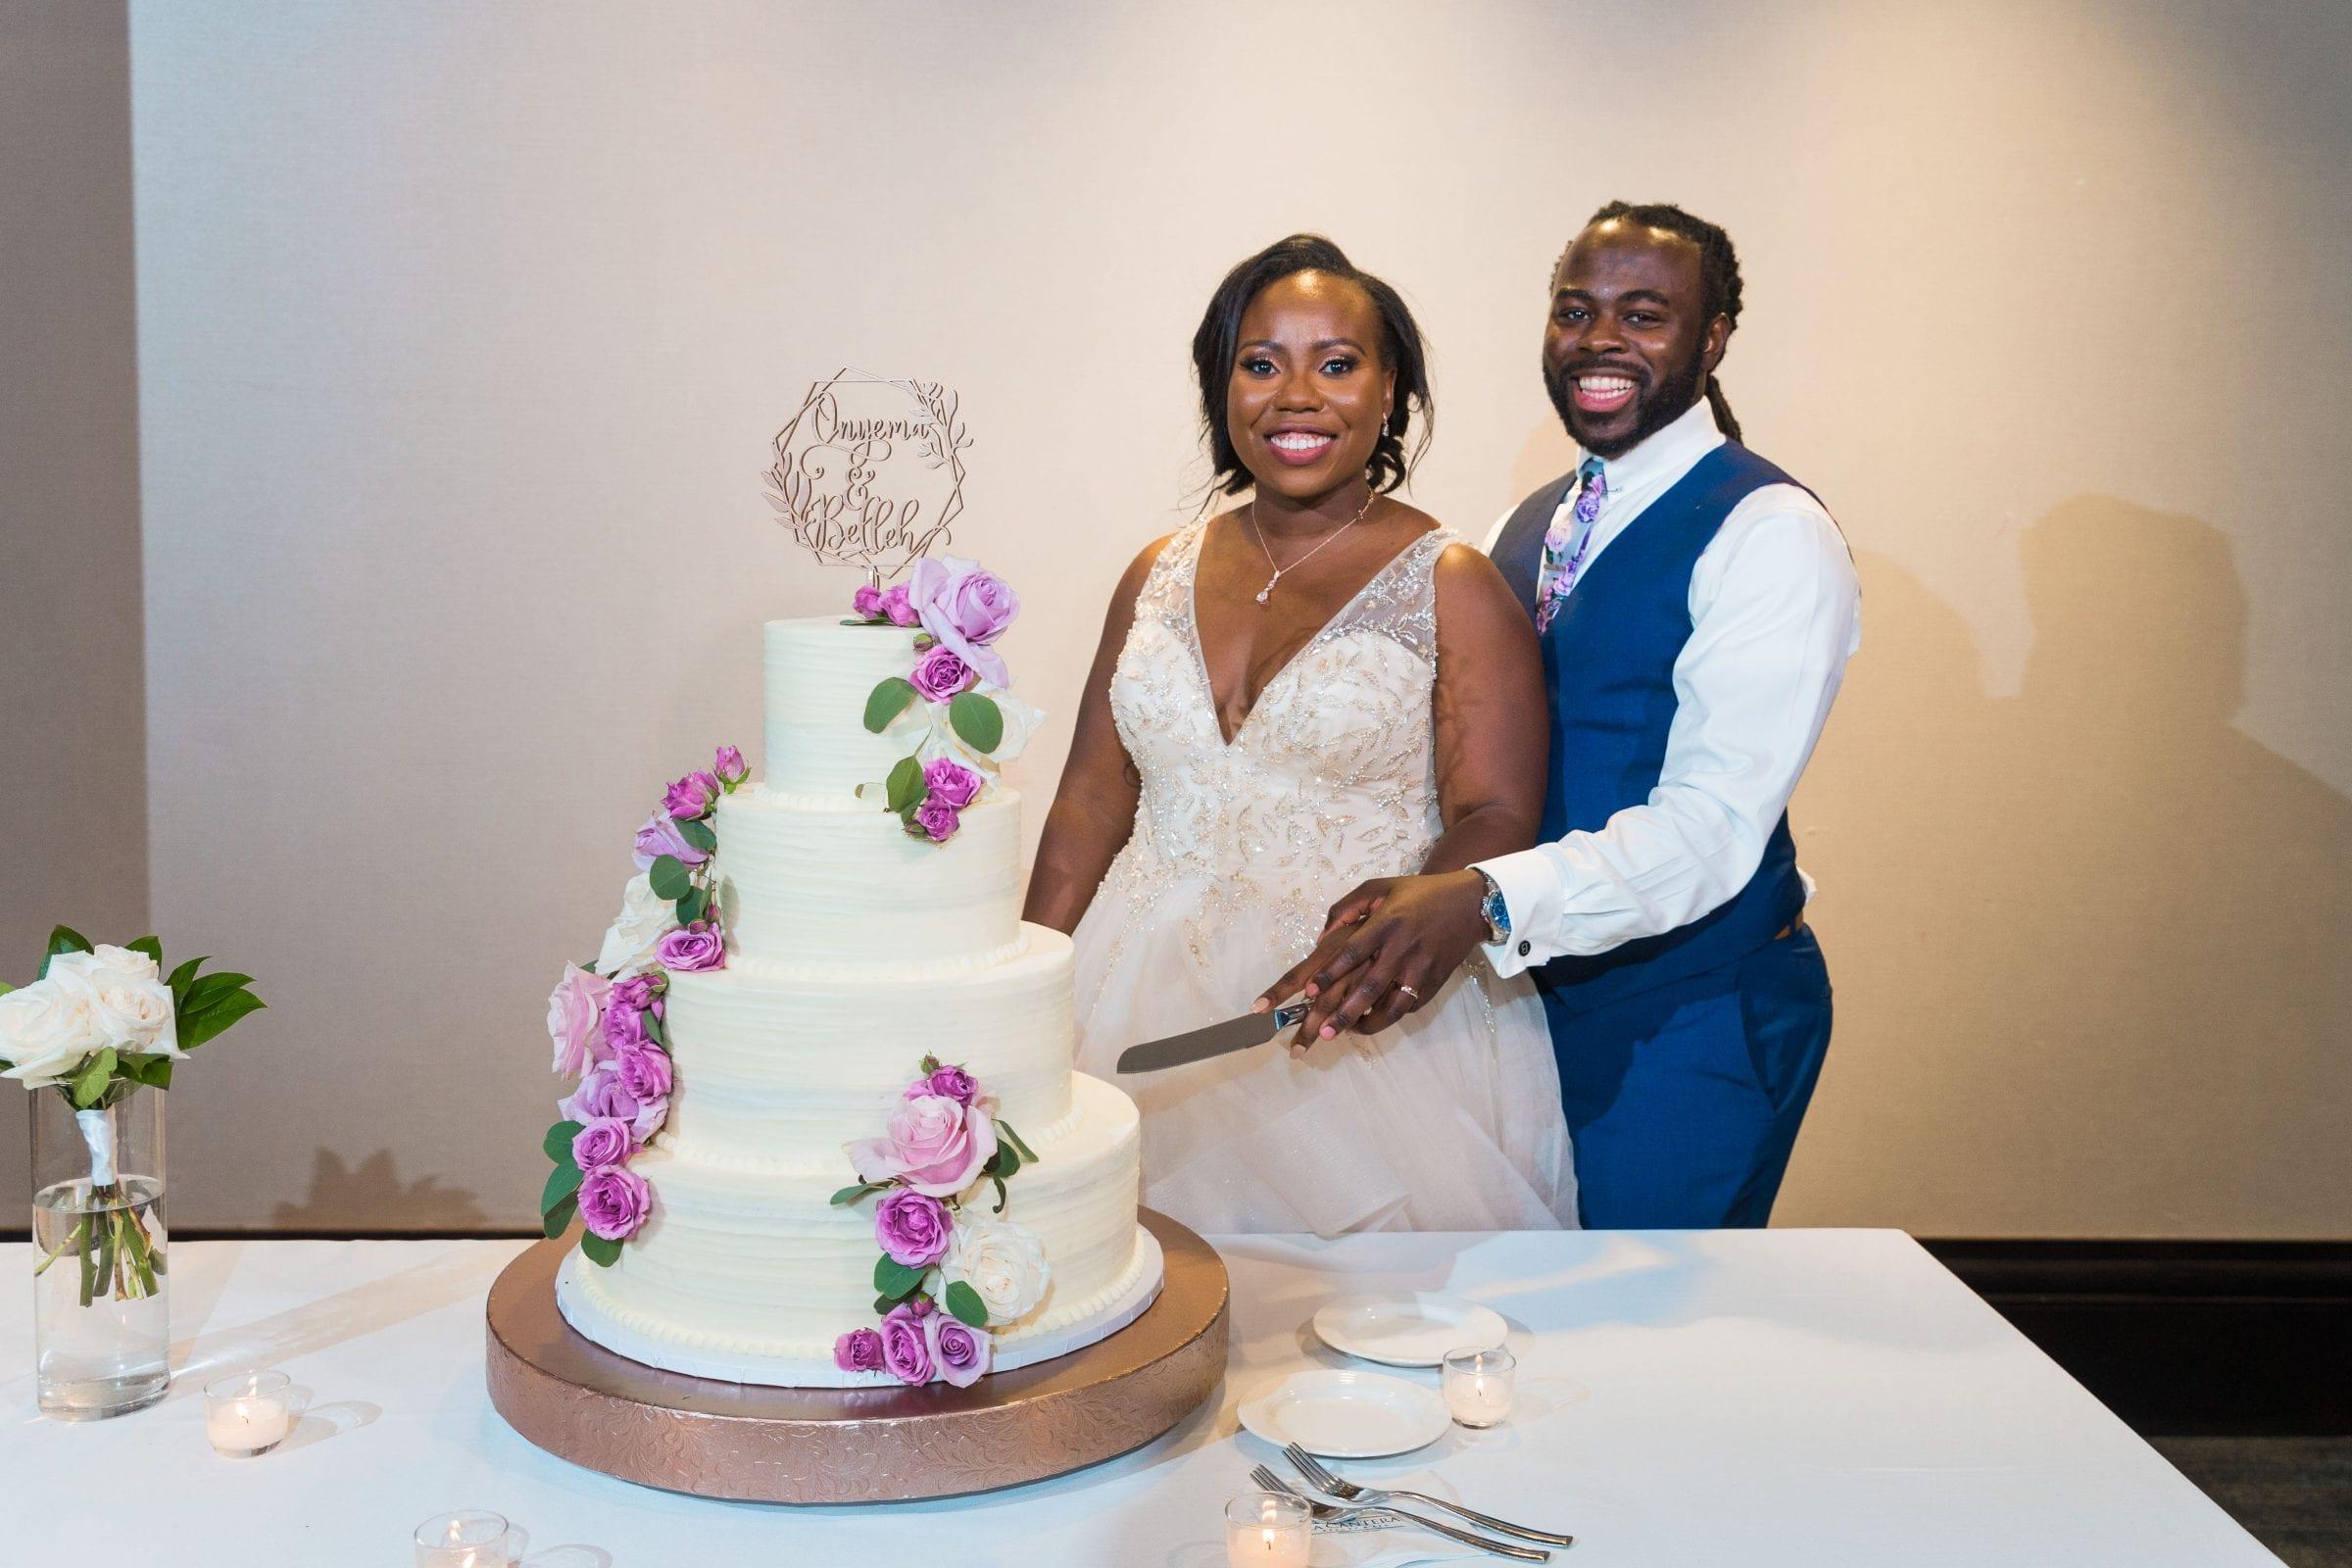 Onyema wedding La Cantera cake cutting